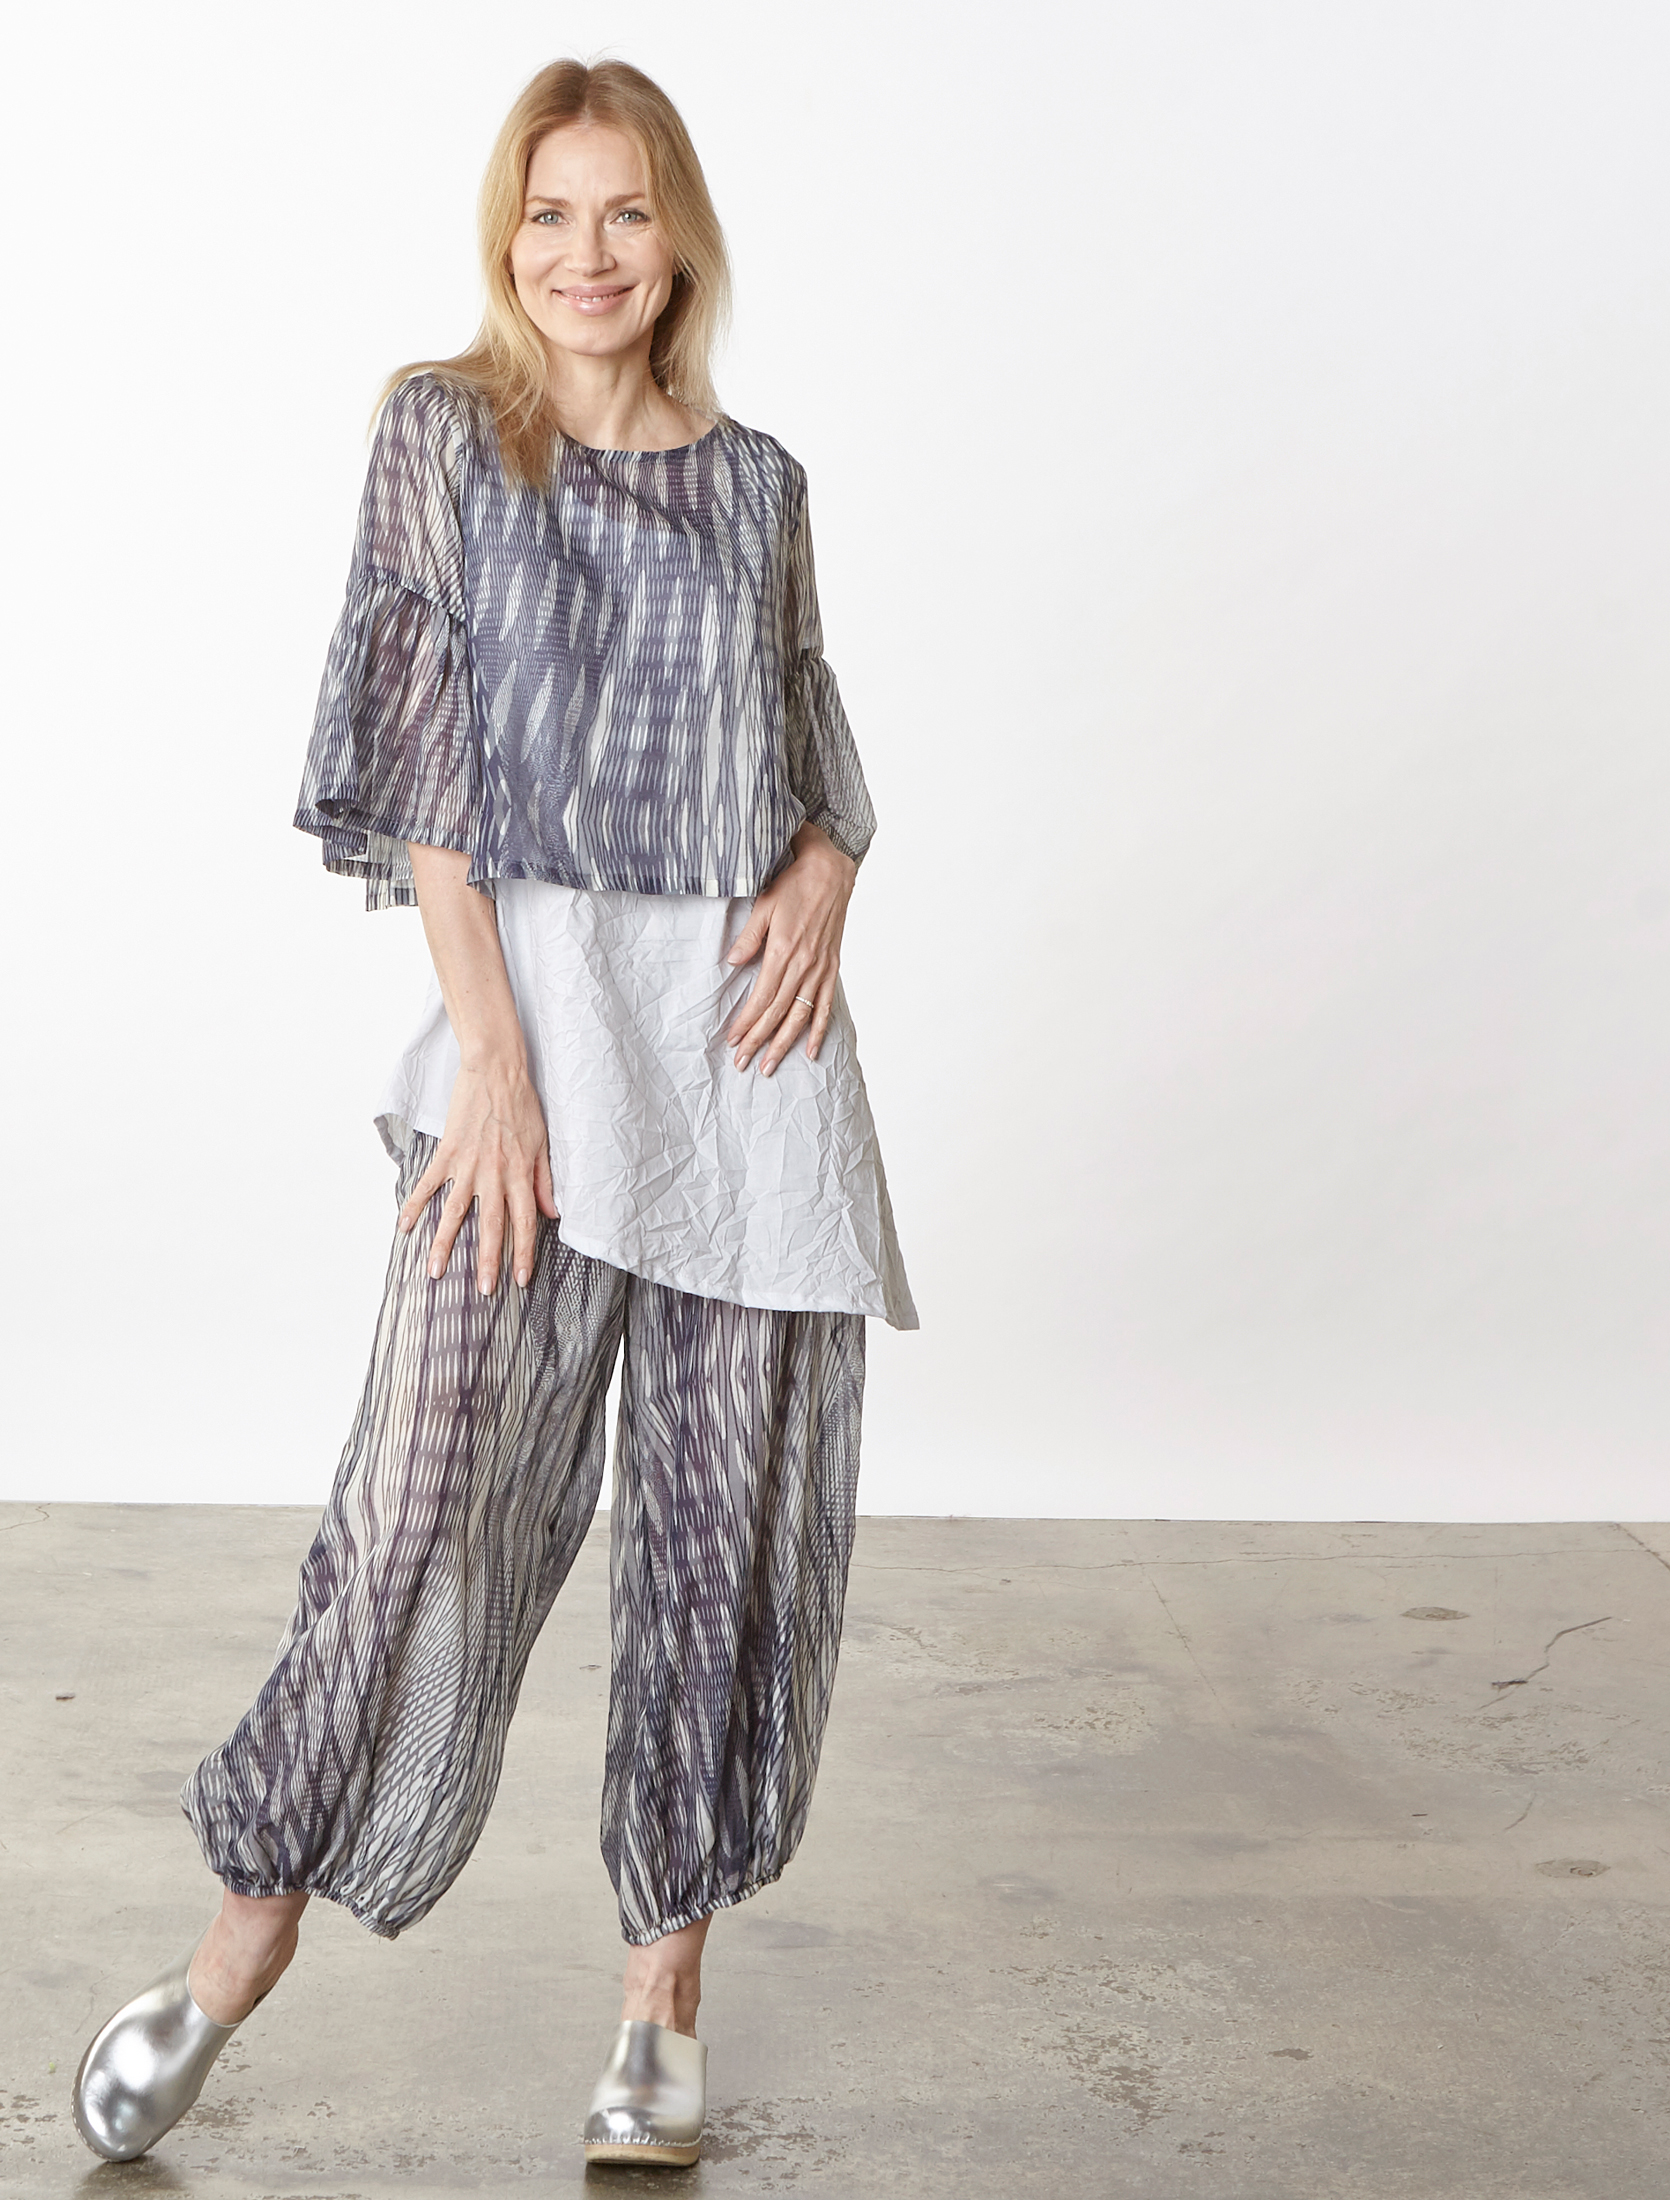 Frida Shirt, Bell Pant in Netto Italian Cotton/Silk, Una Tunic in Ice Italian Crinkle Cotton